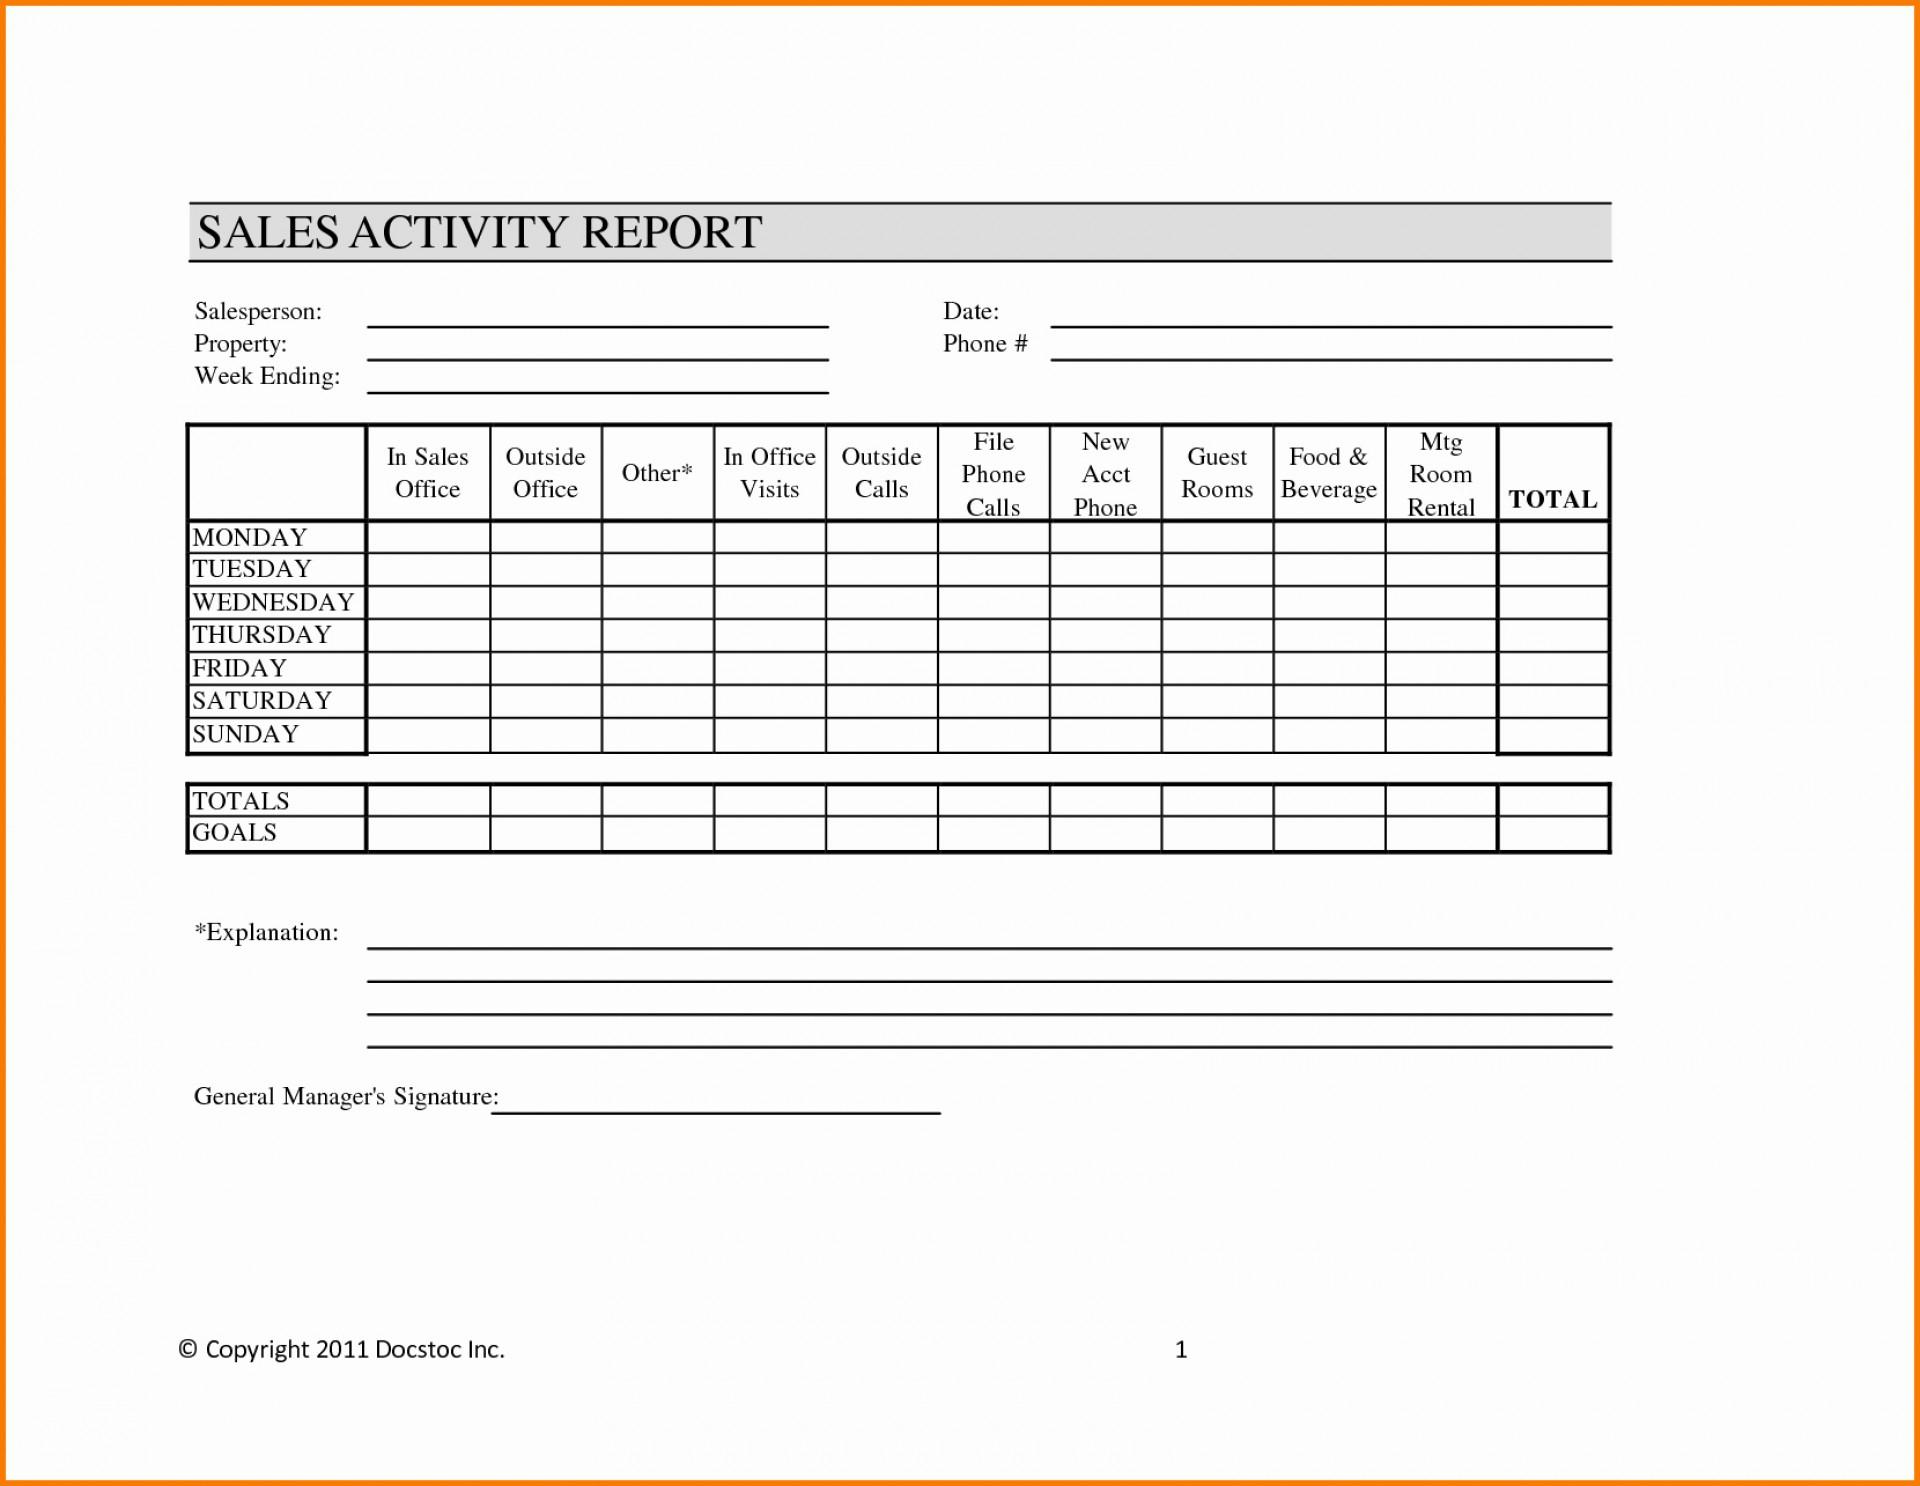 Sales Visit Report Template Downloads - Atlantaauctionco for Sales Visit Report Template Downloads